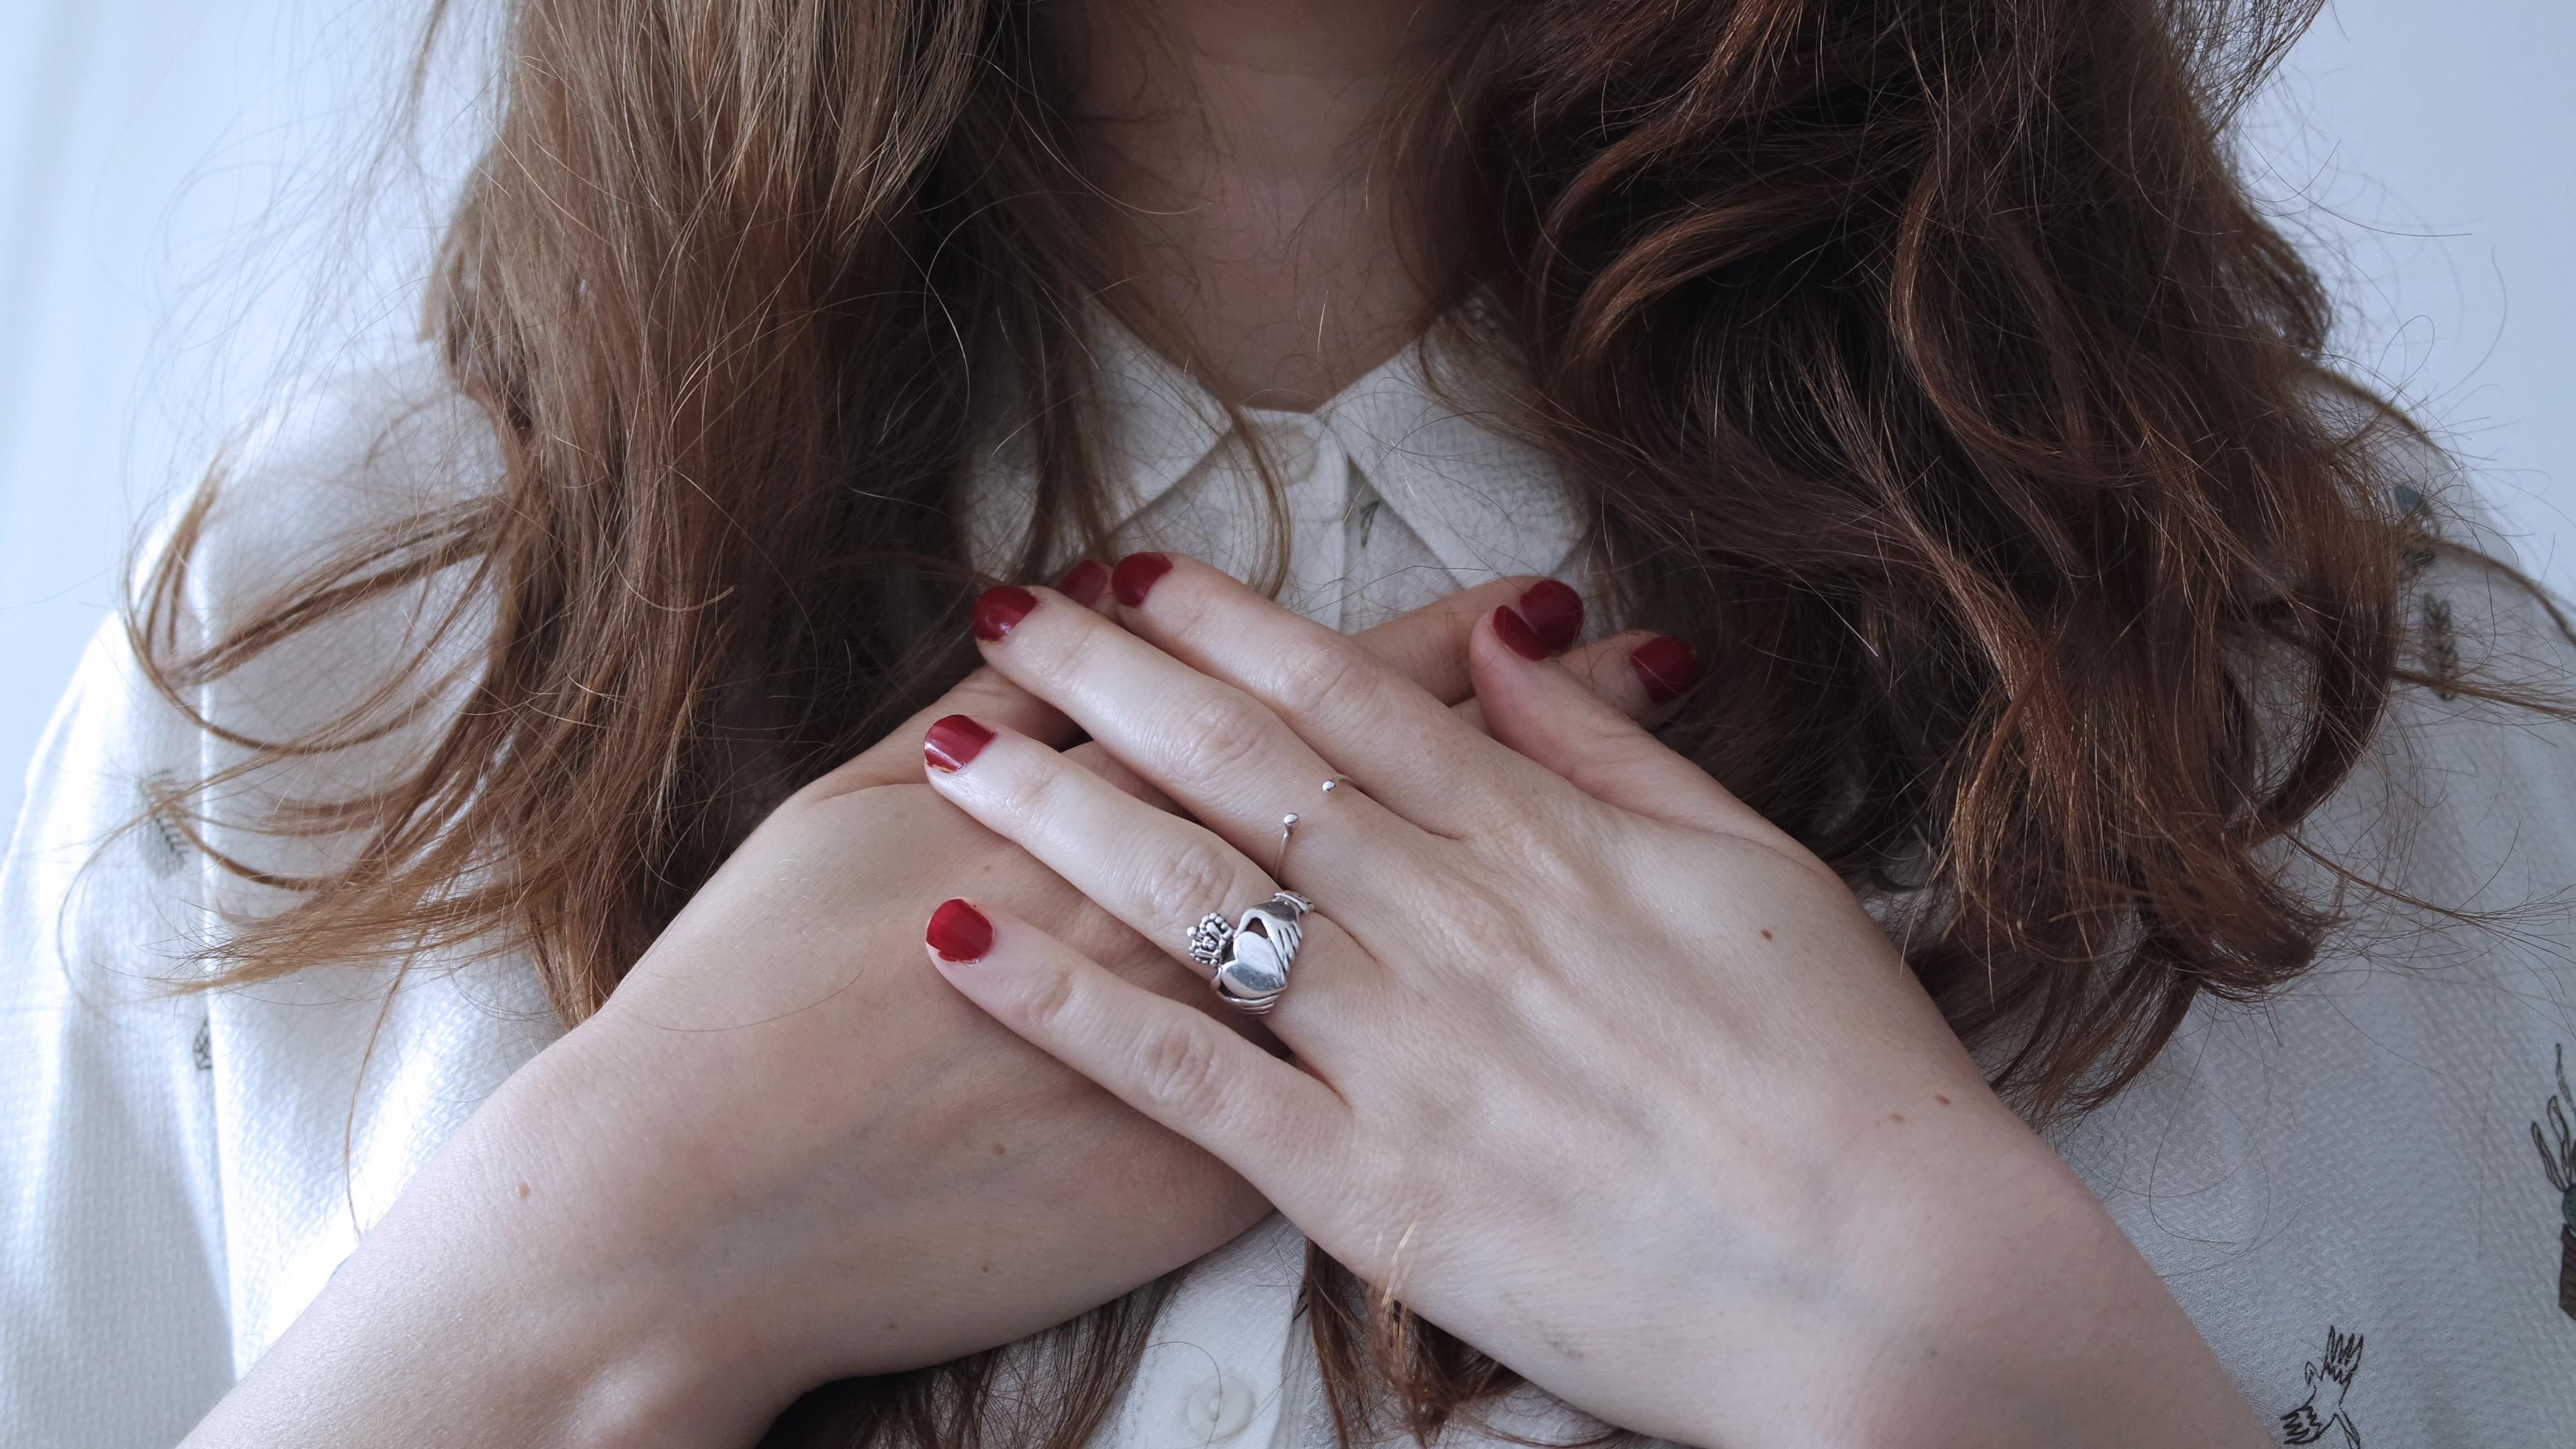 girl hands to heart